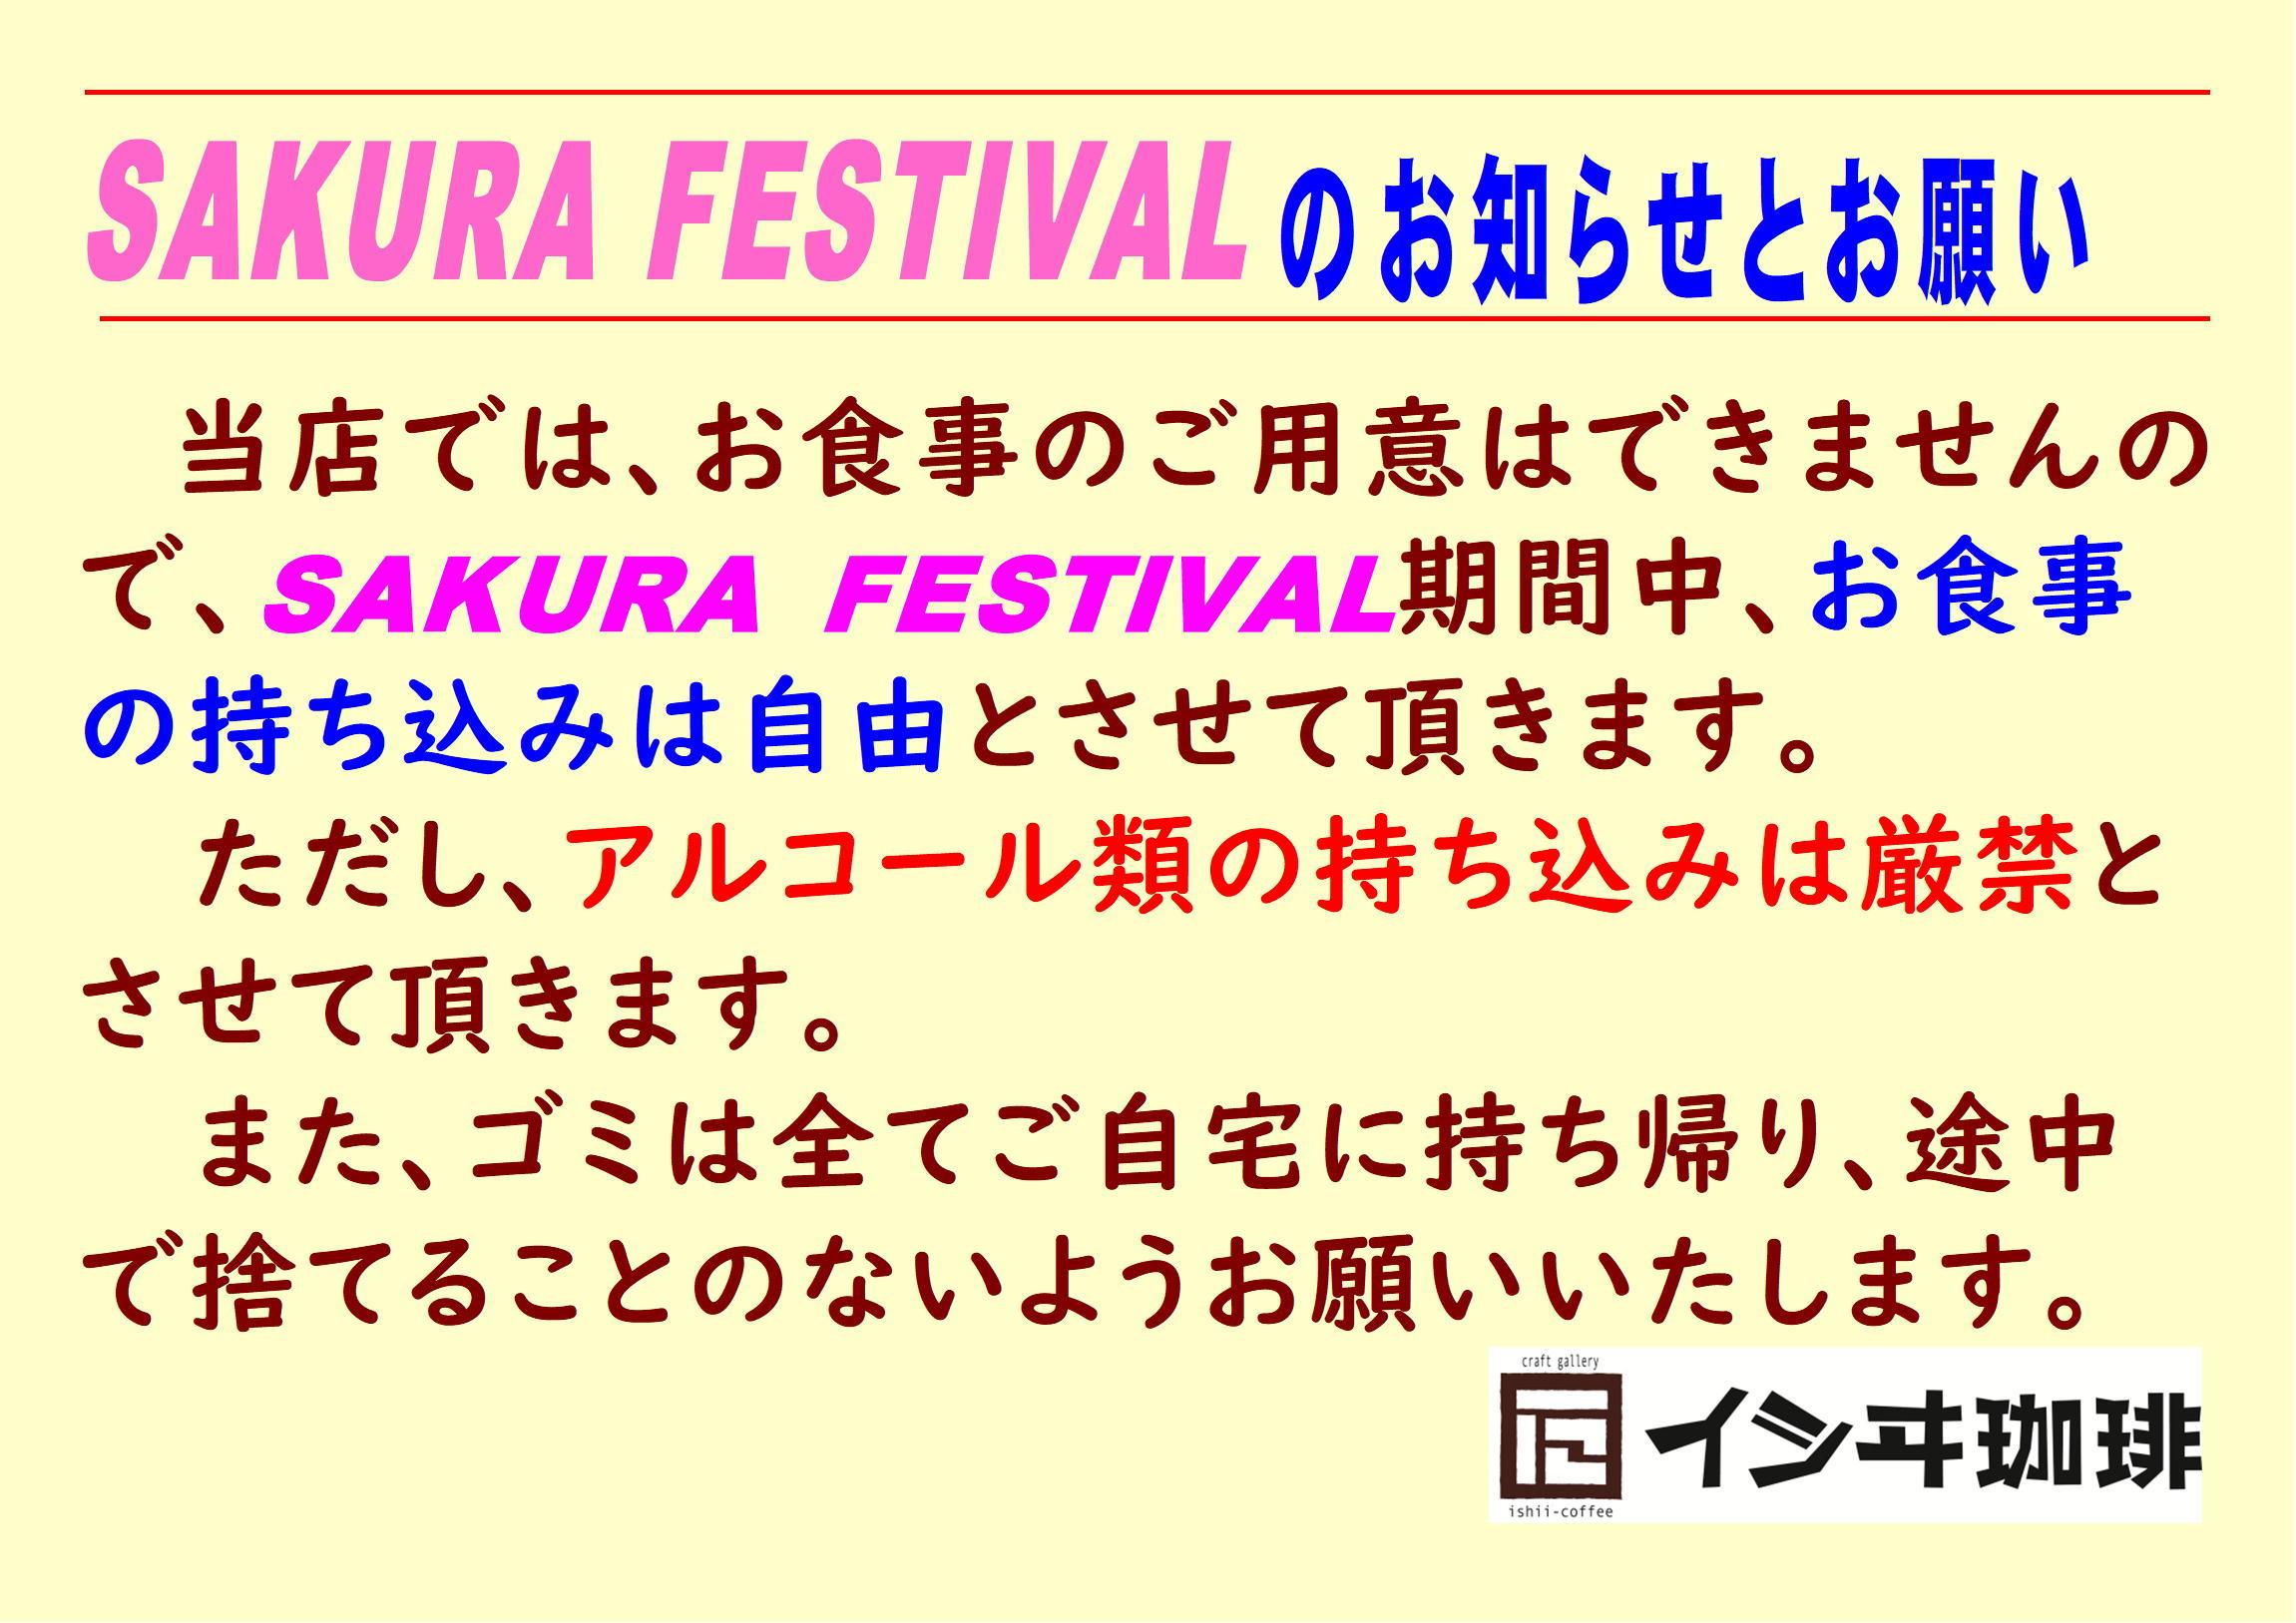 SAKURA FESTIVAL 2019 のお知らせ_d0237446_17291499.jpg